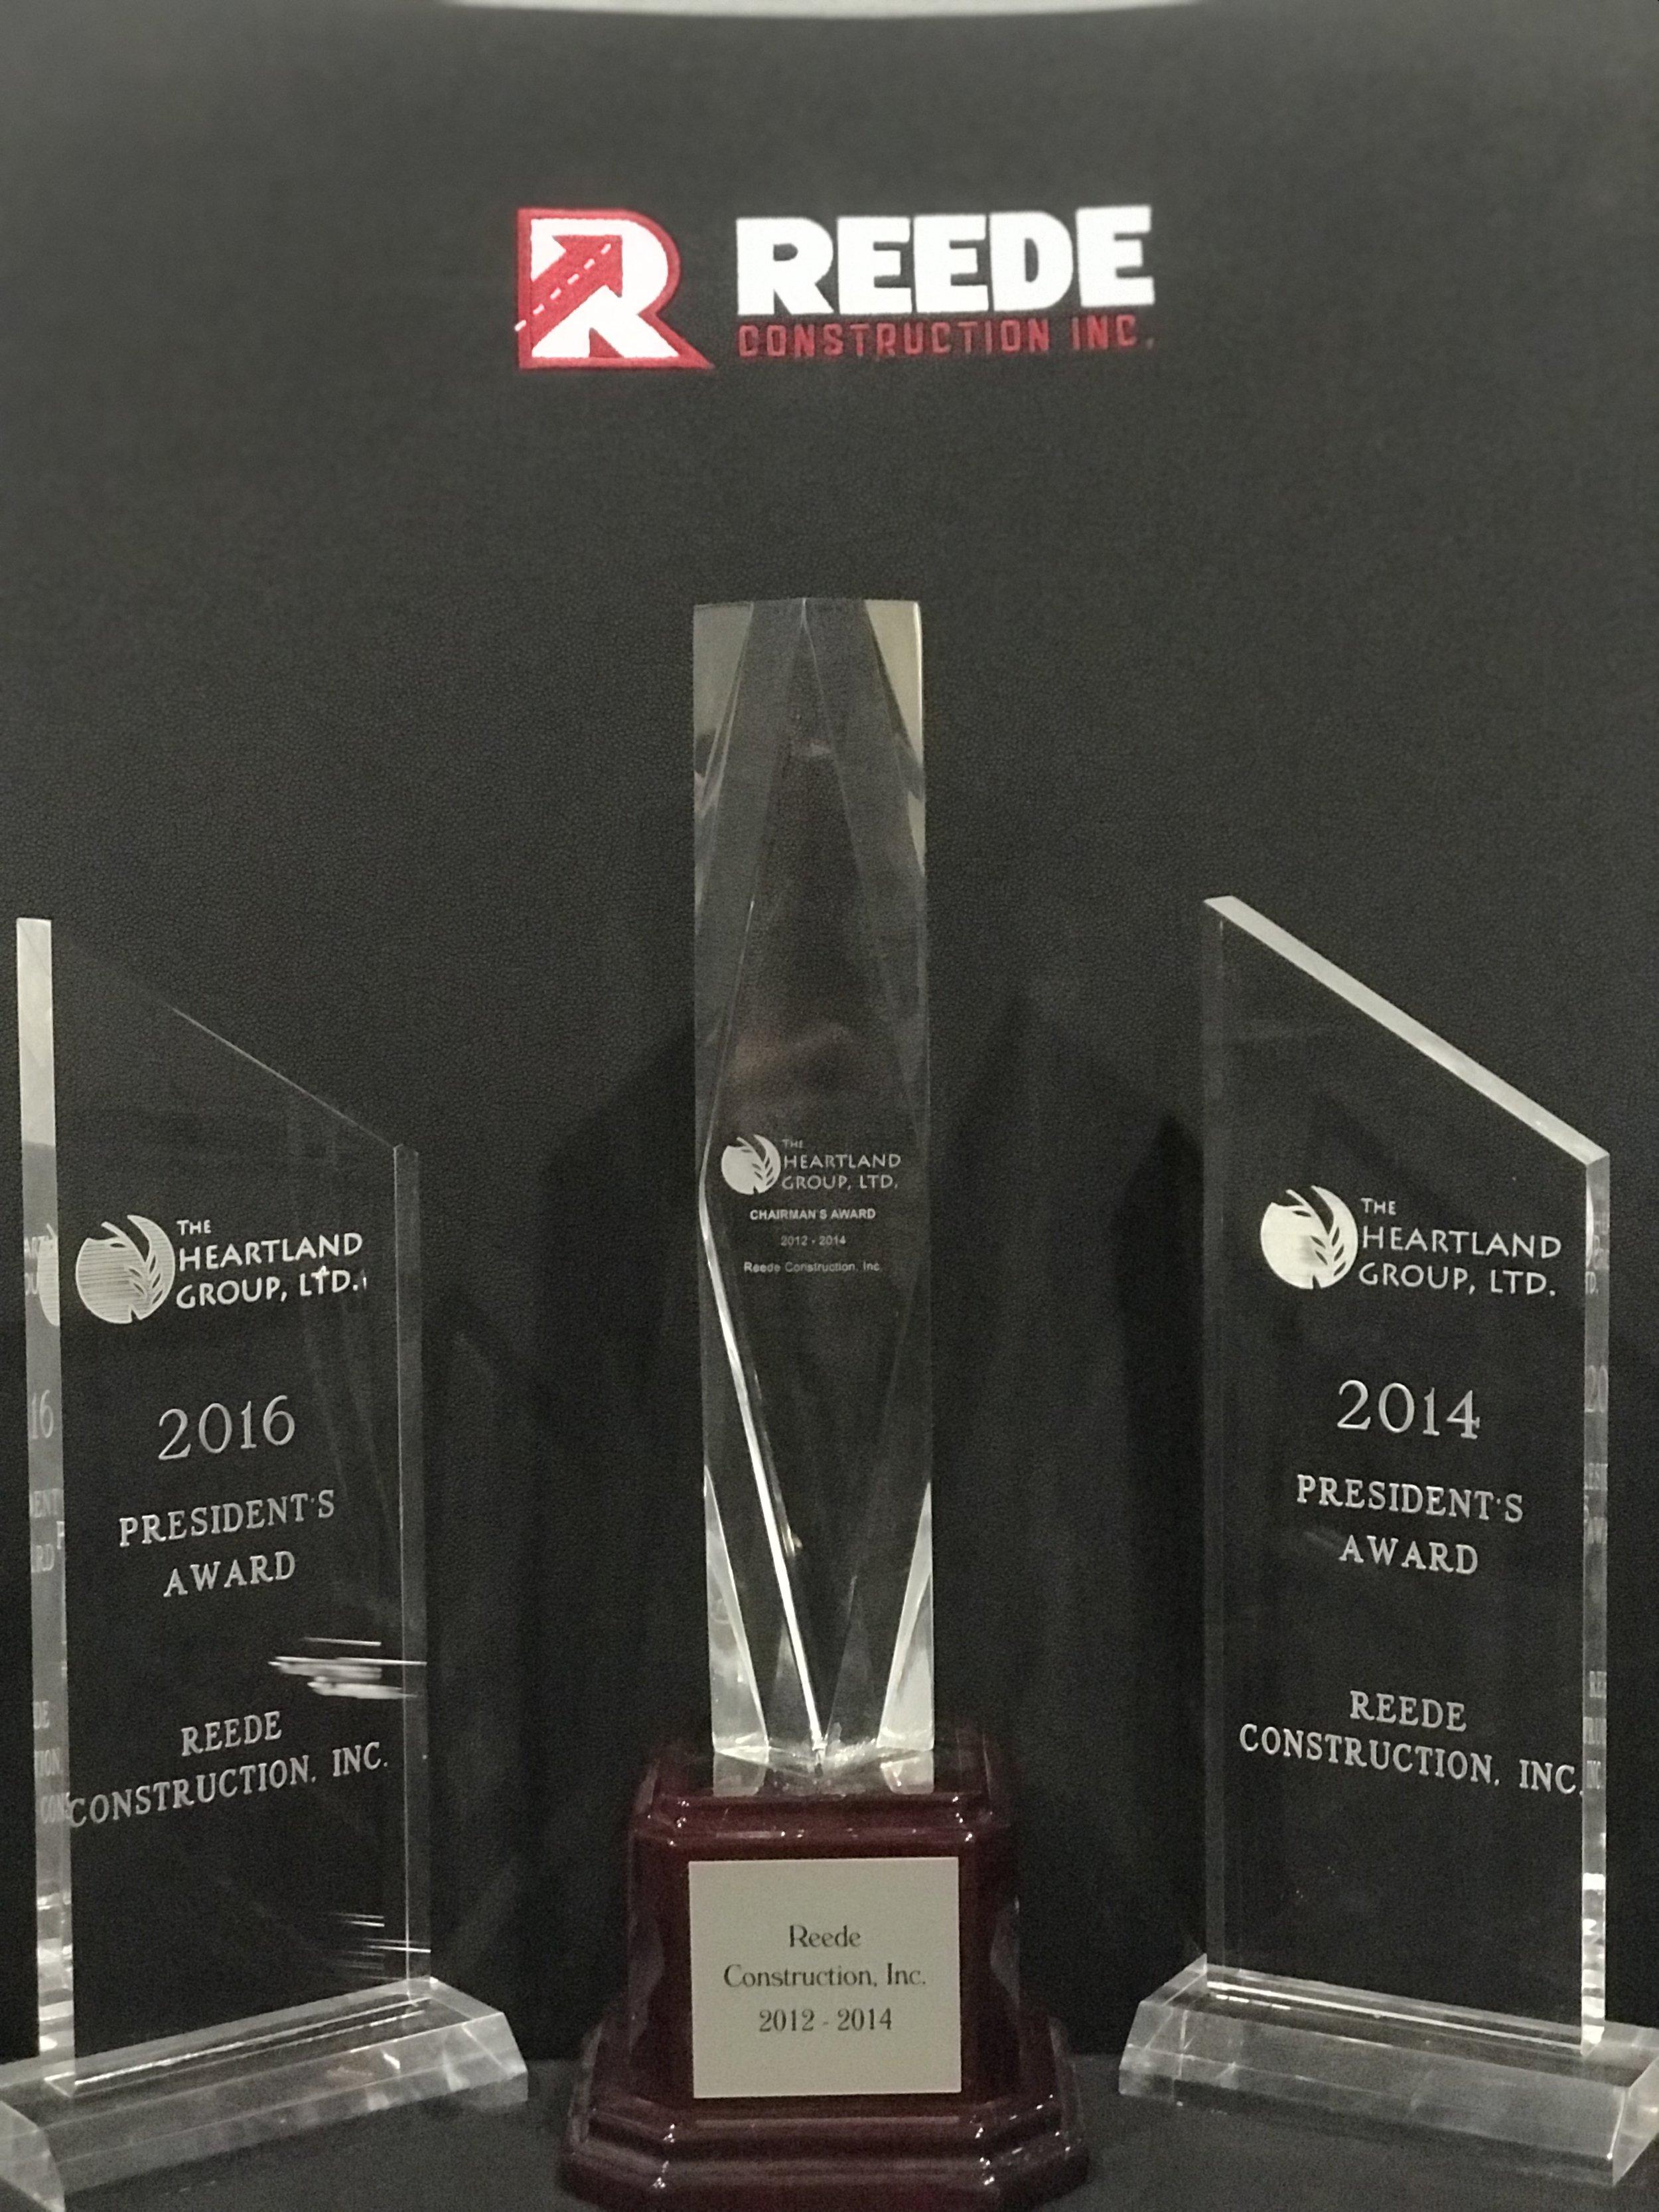 2014 & 2015 President's Award. 2012/2014 Chairman's Award